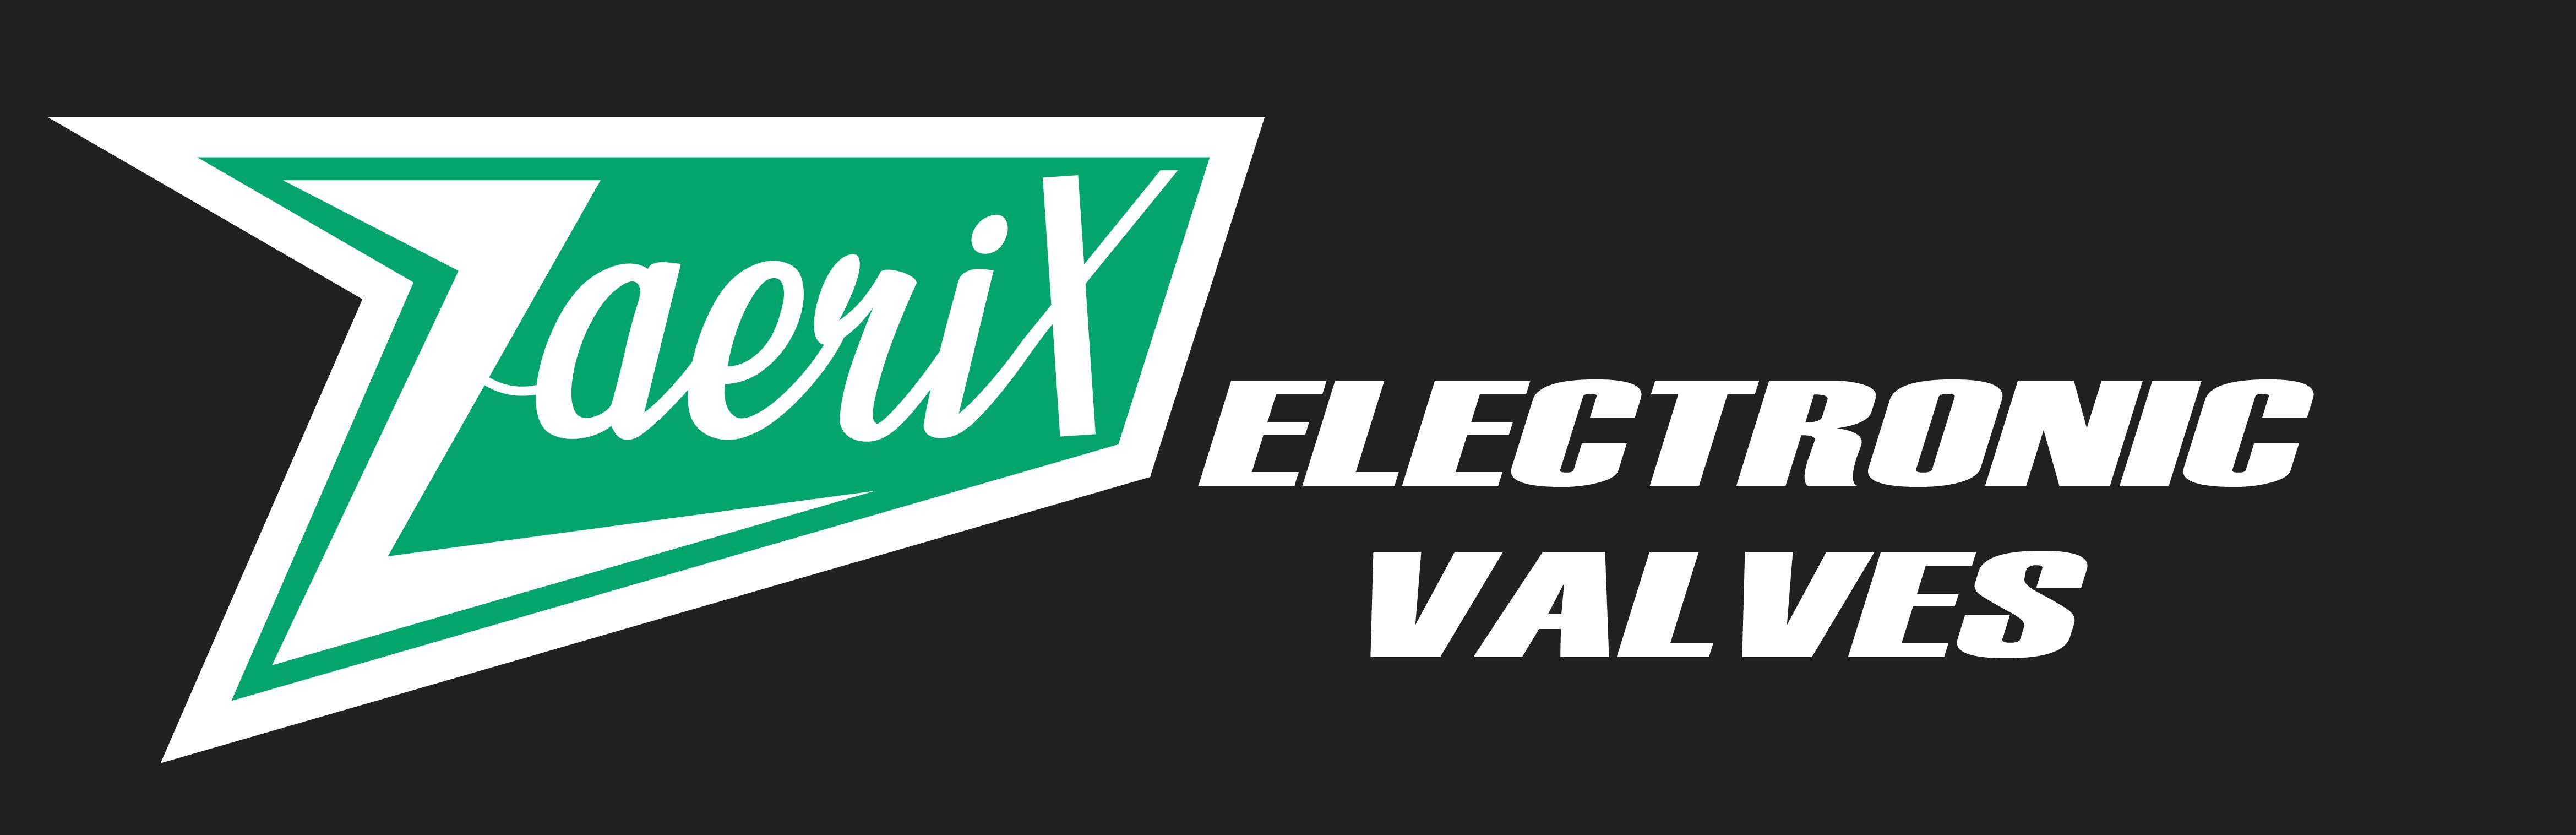 Zaerix Dark Logo image